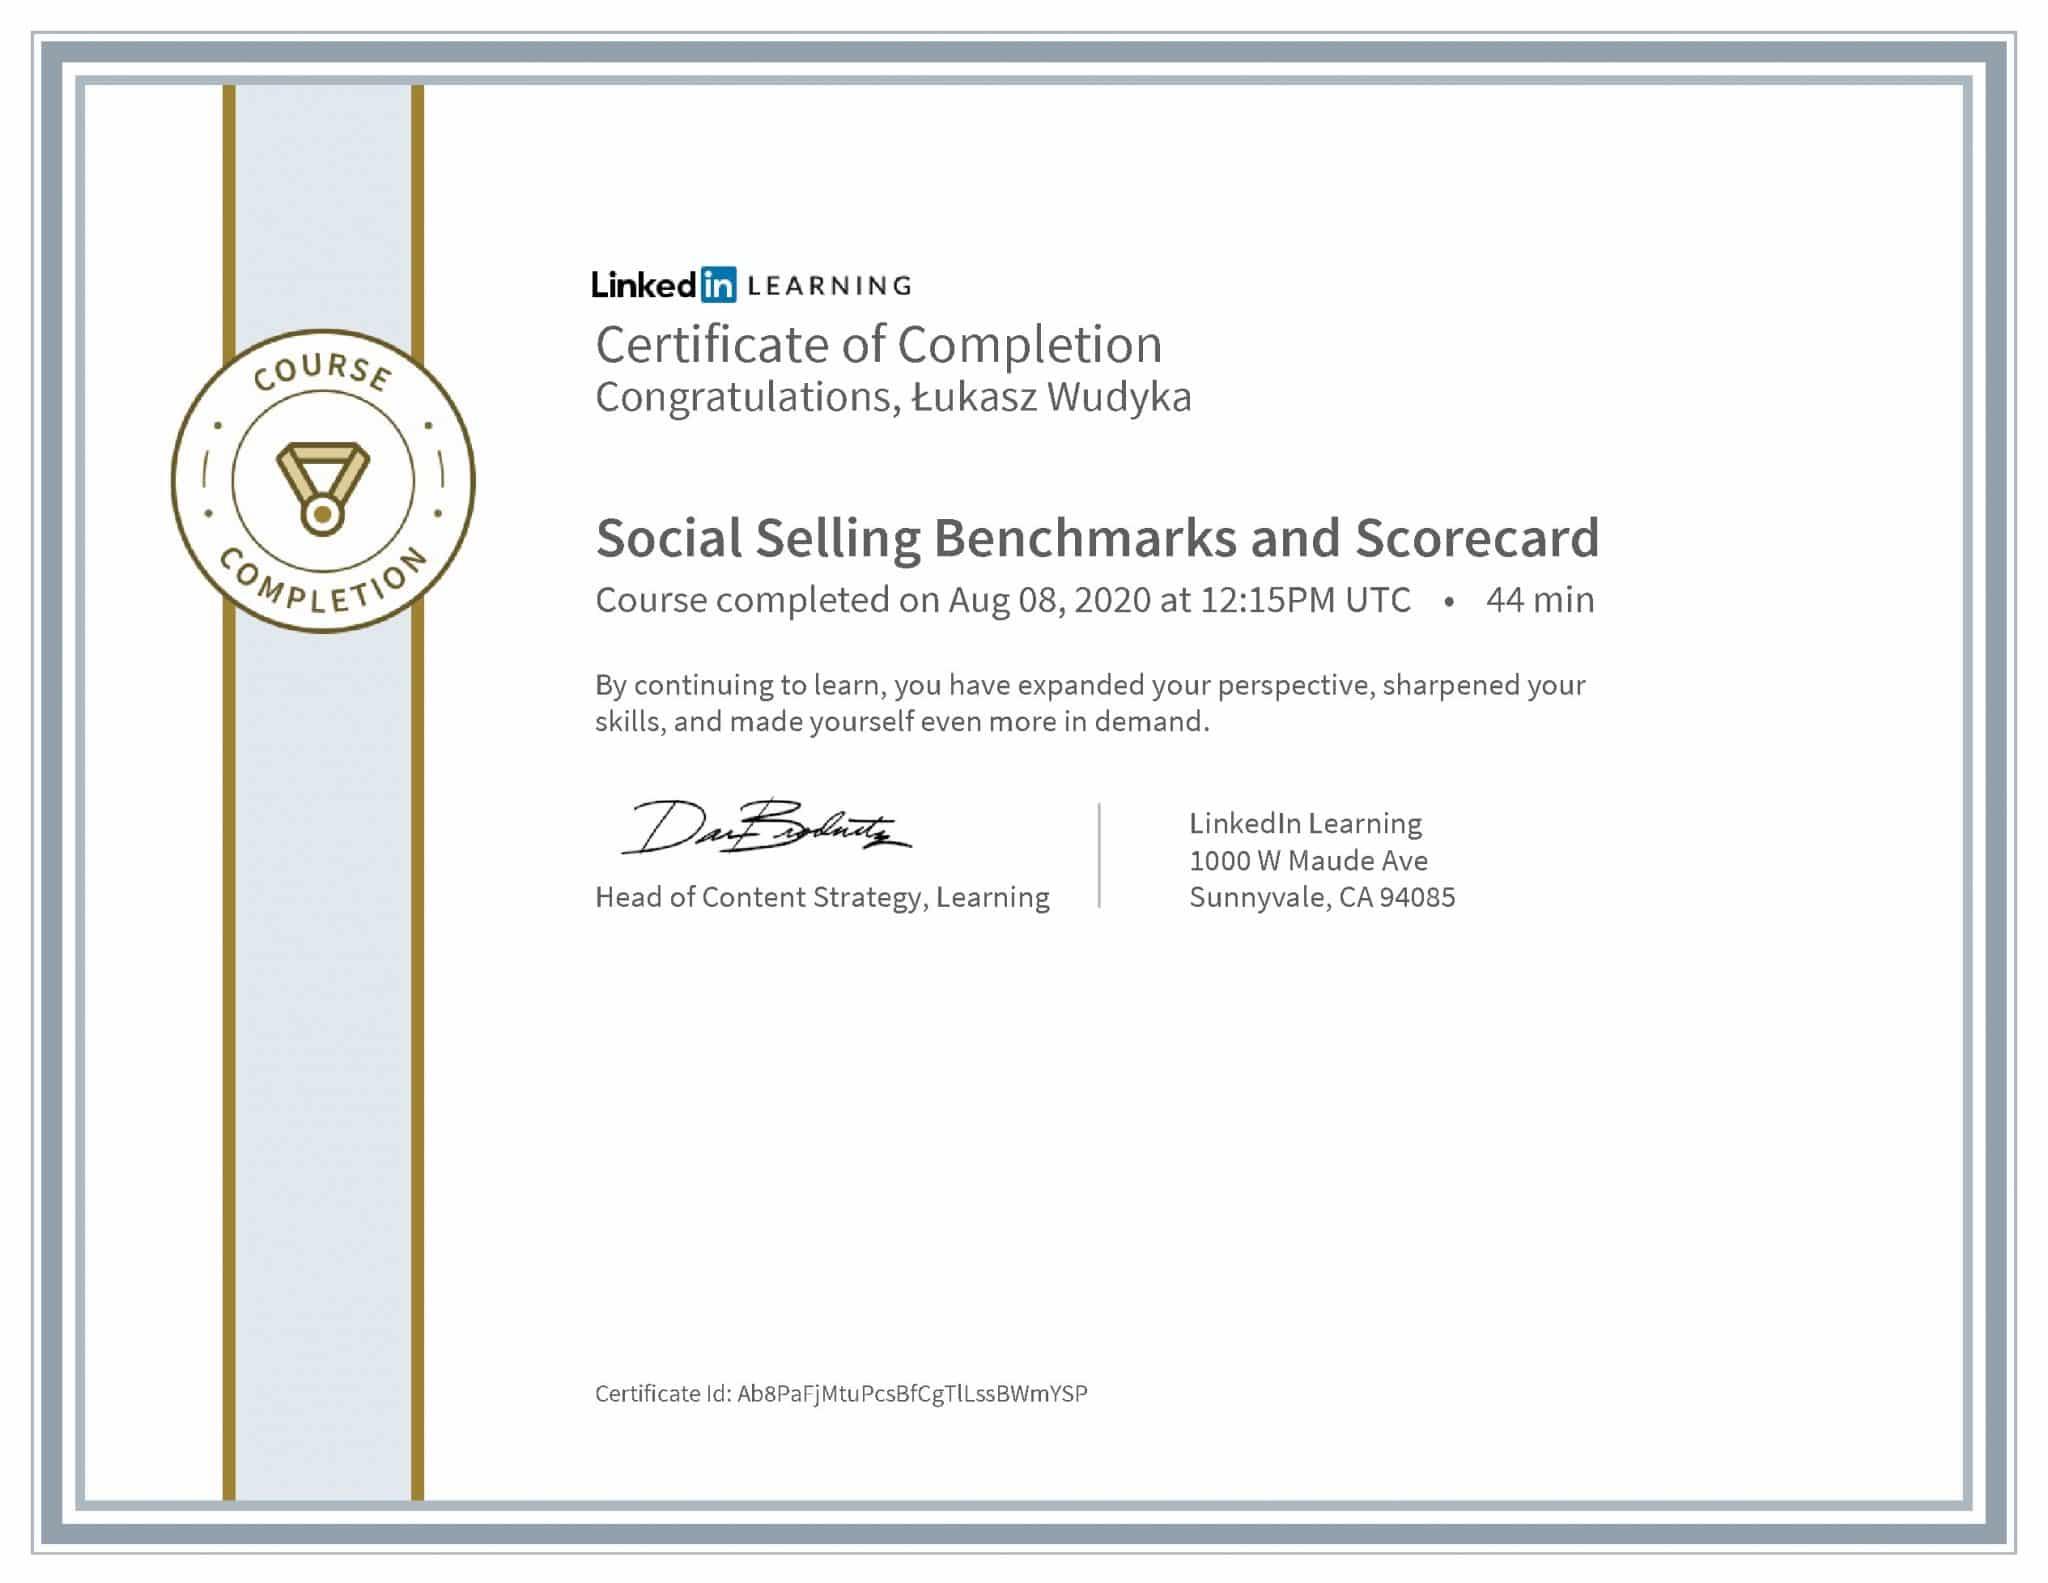 Łukasz Wudyka certyfikat LinkedIn Social Selling Benchmarks and Scorecard